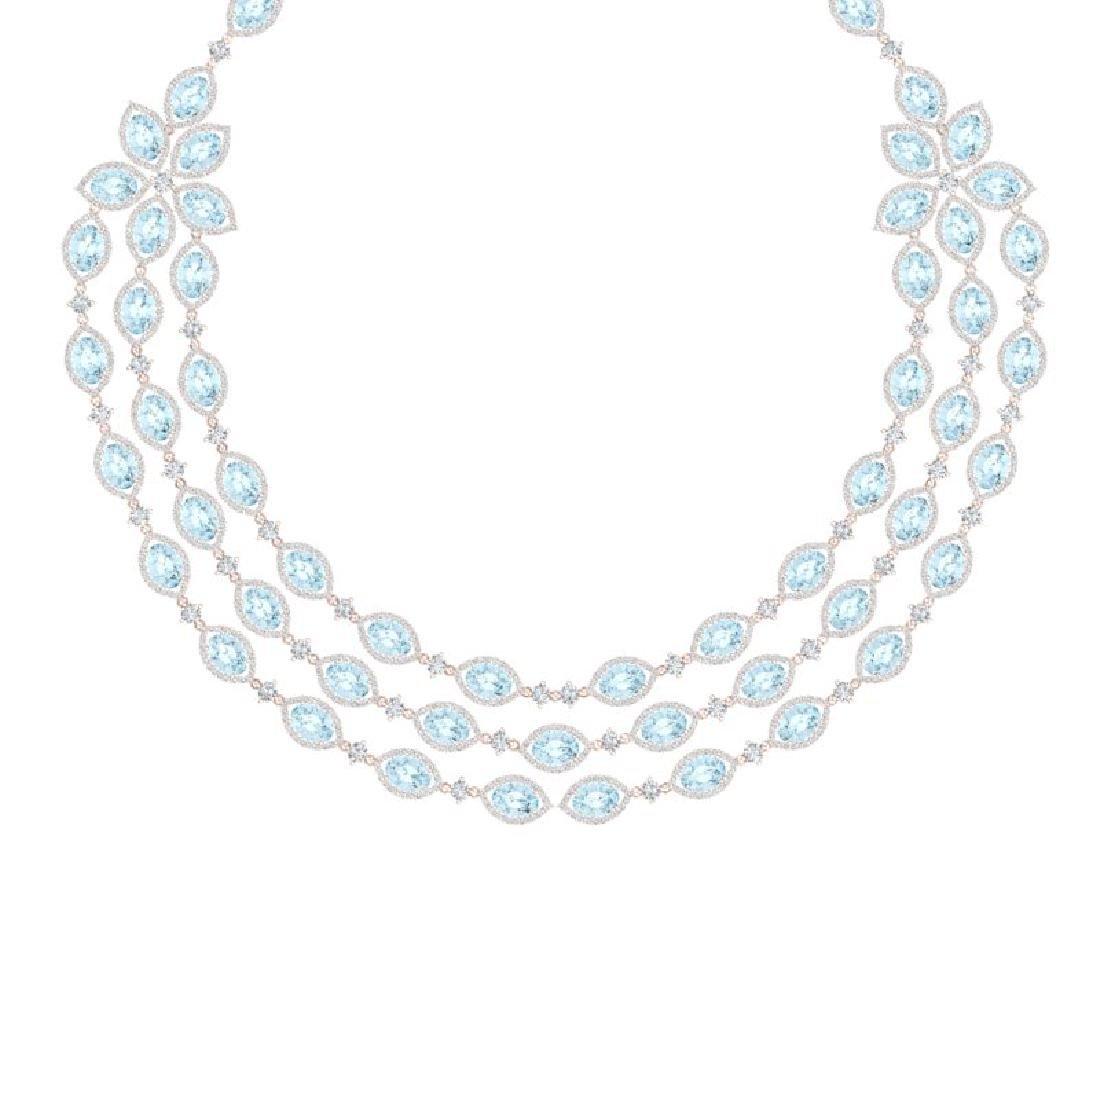 84.57 CTW Royalty Sky Topaz & VS Diamond Necklace 18K - 2